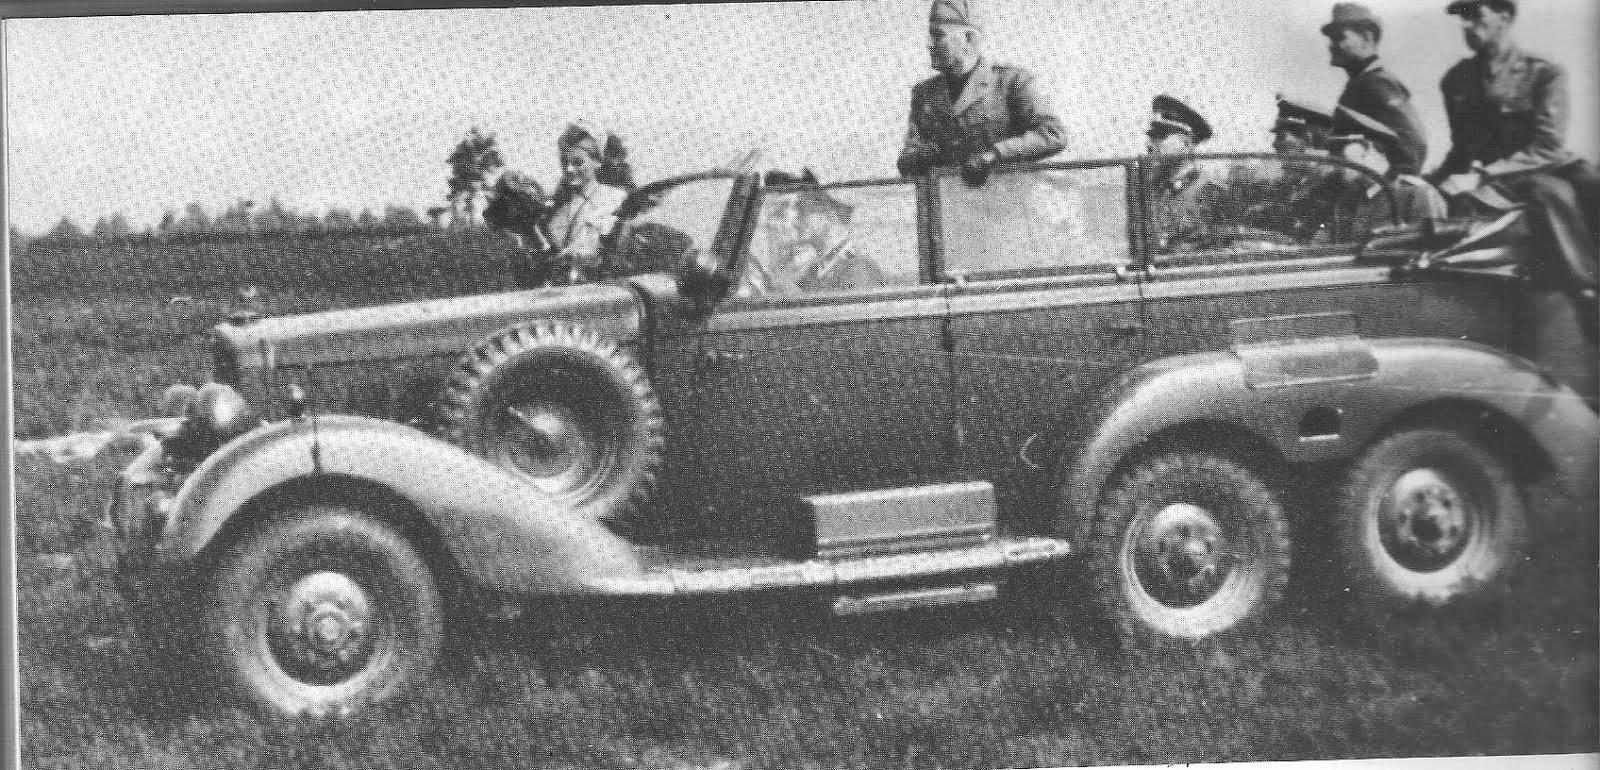 SENNELAGER (GERMANIA) 18 LUGLIO 1944